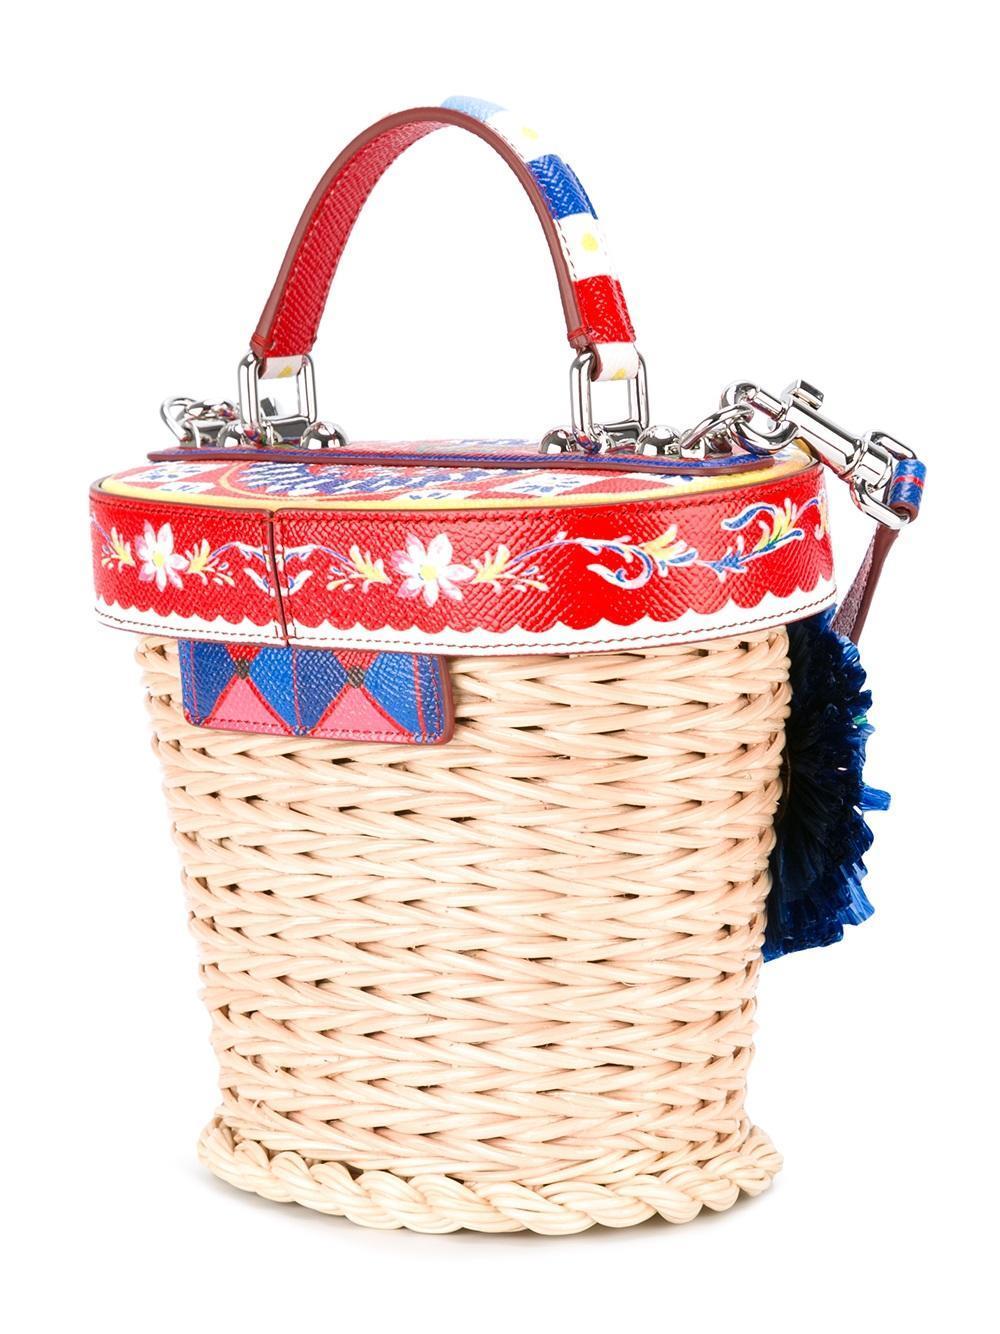 Dolce & Gabbana Leather Dolce Wicker Basket Tote